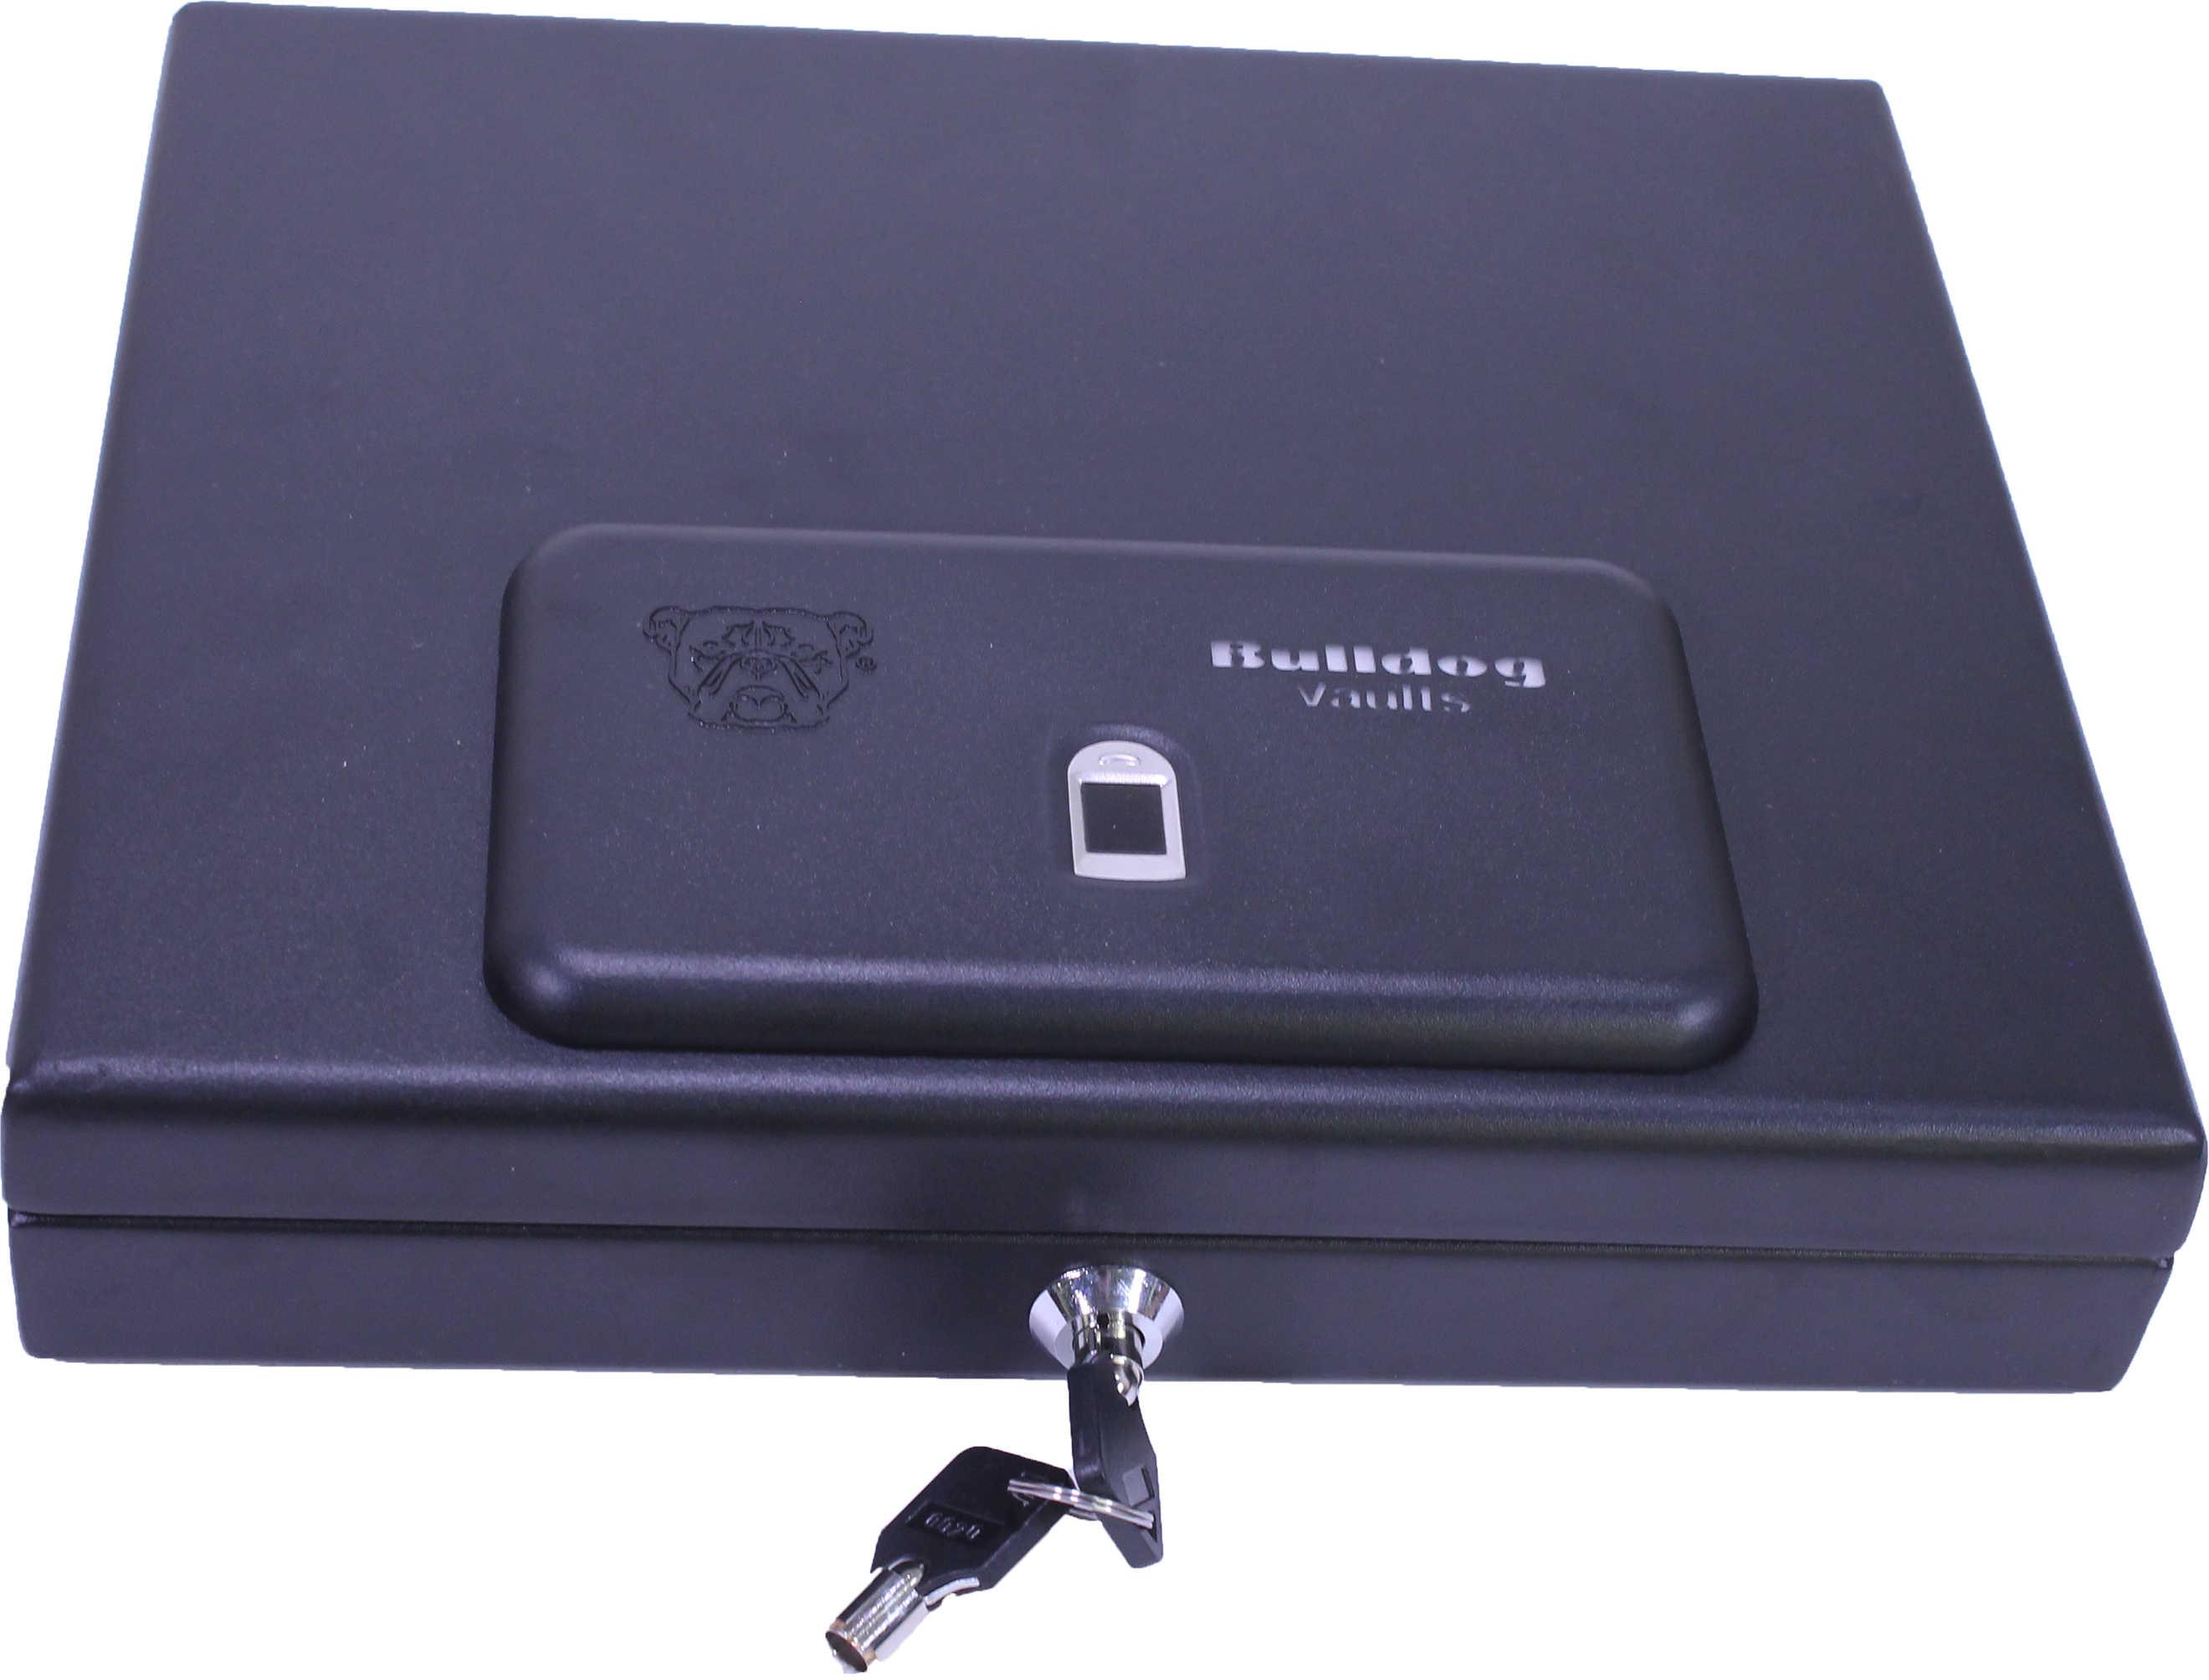 "Bulldog Cases Top Load Pistol Vault 11.5"" x 9.8"" x 2.5"", Biometric Fingerprint, Magnum, Black Md: BD4055B"